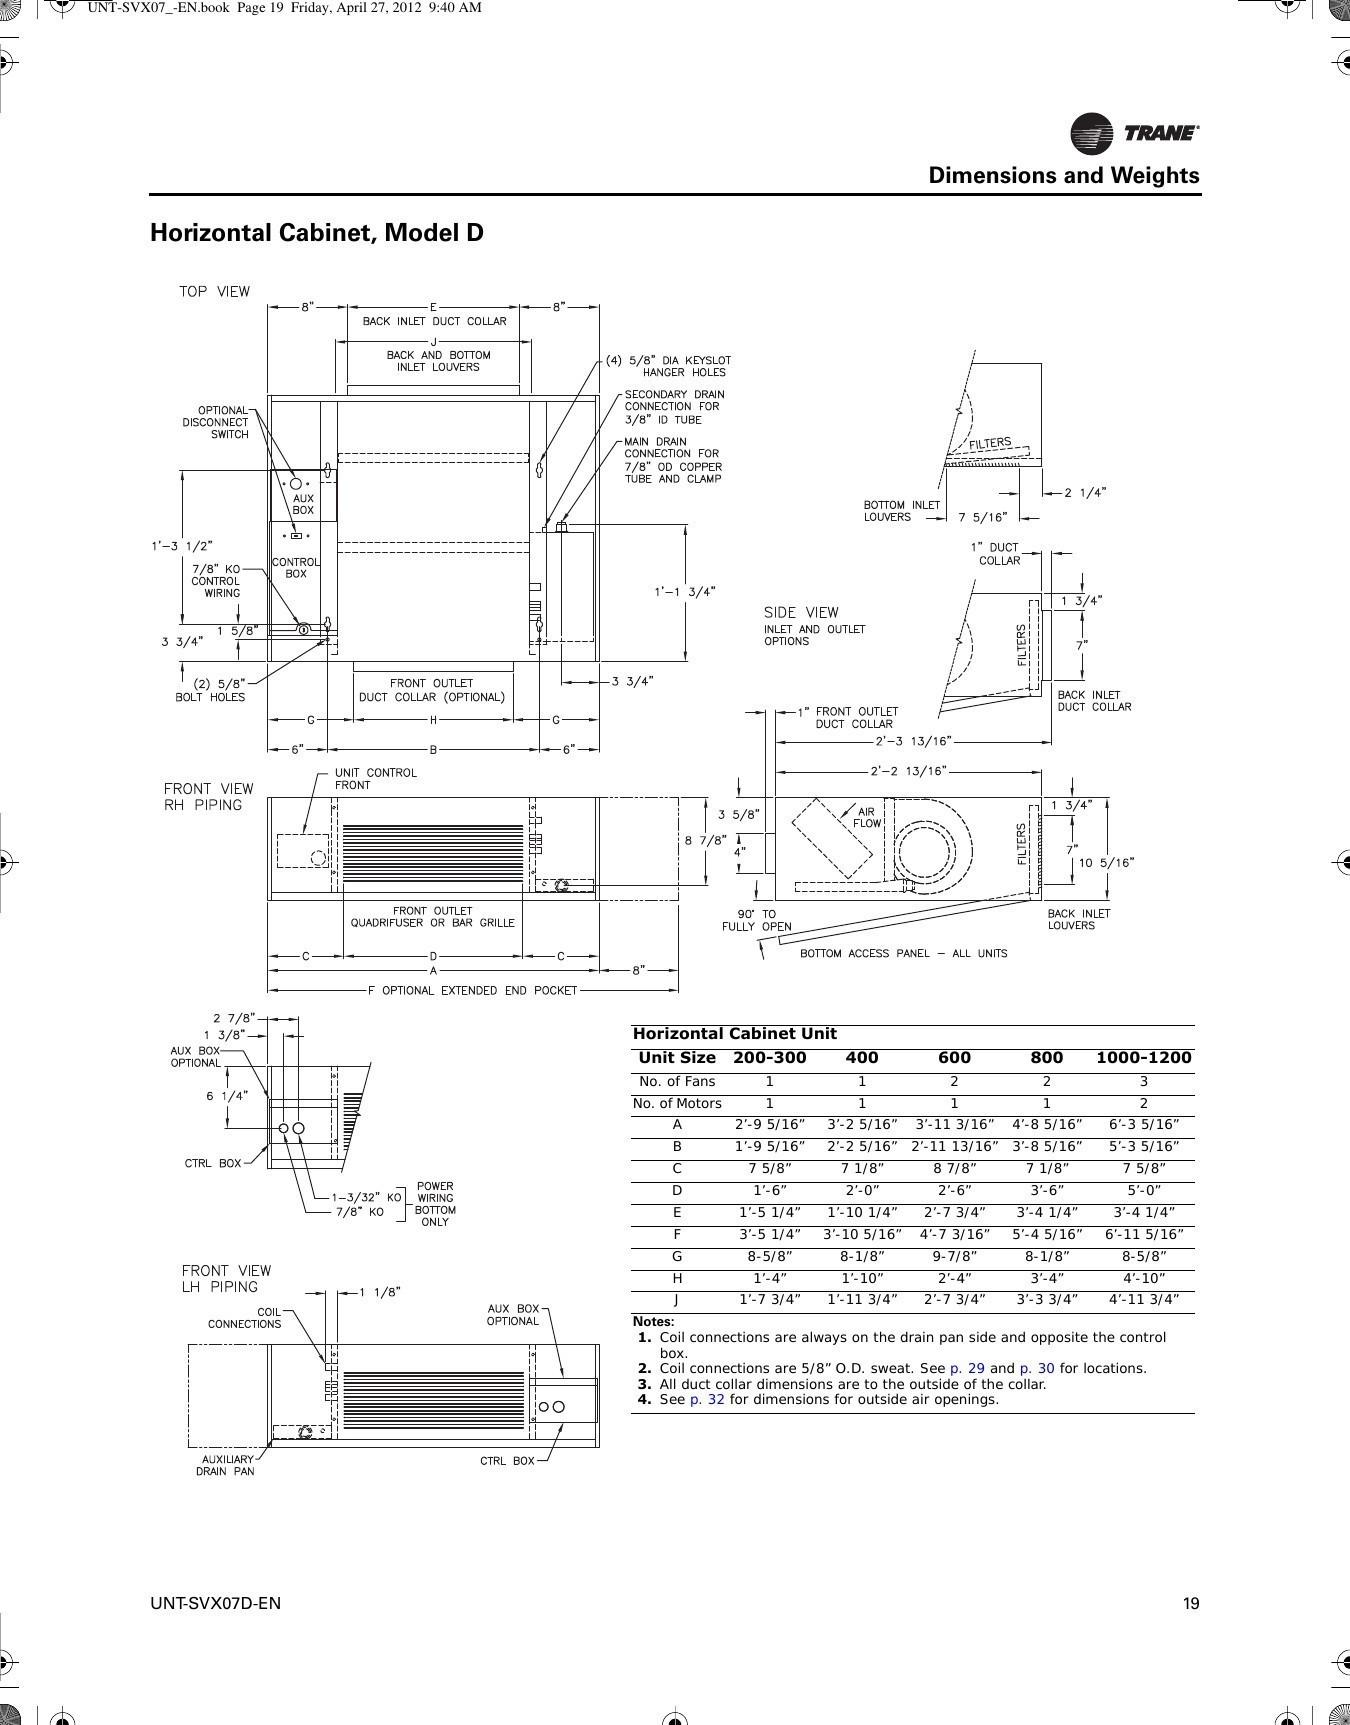 Carrier Heat Pump thermostat Wiring Diagram Carrier Hvac thermostat Wiring Diagram Shahsramblings Of Carrier Heat Pump thermostat Wiring Diagram